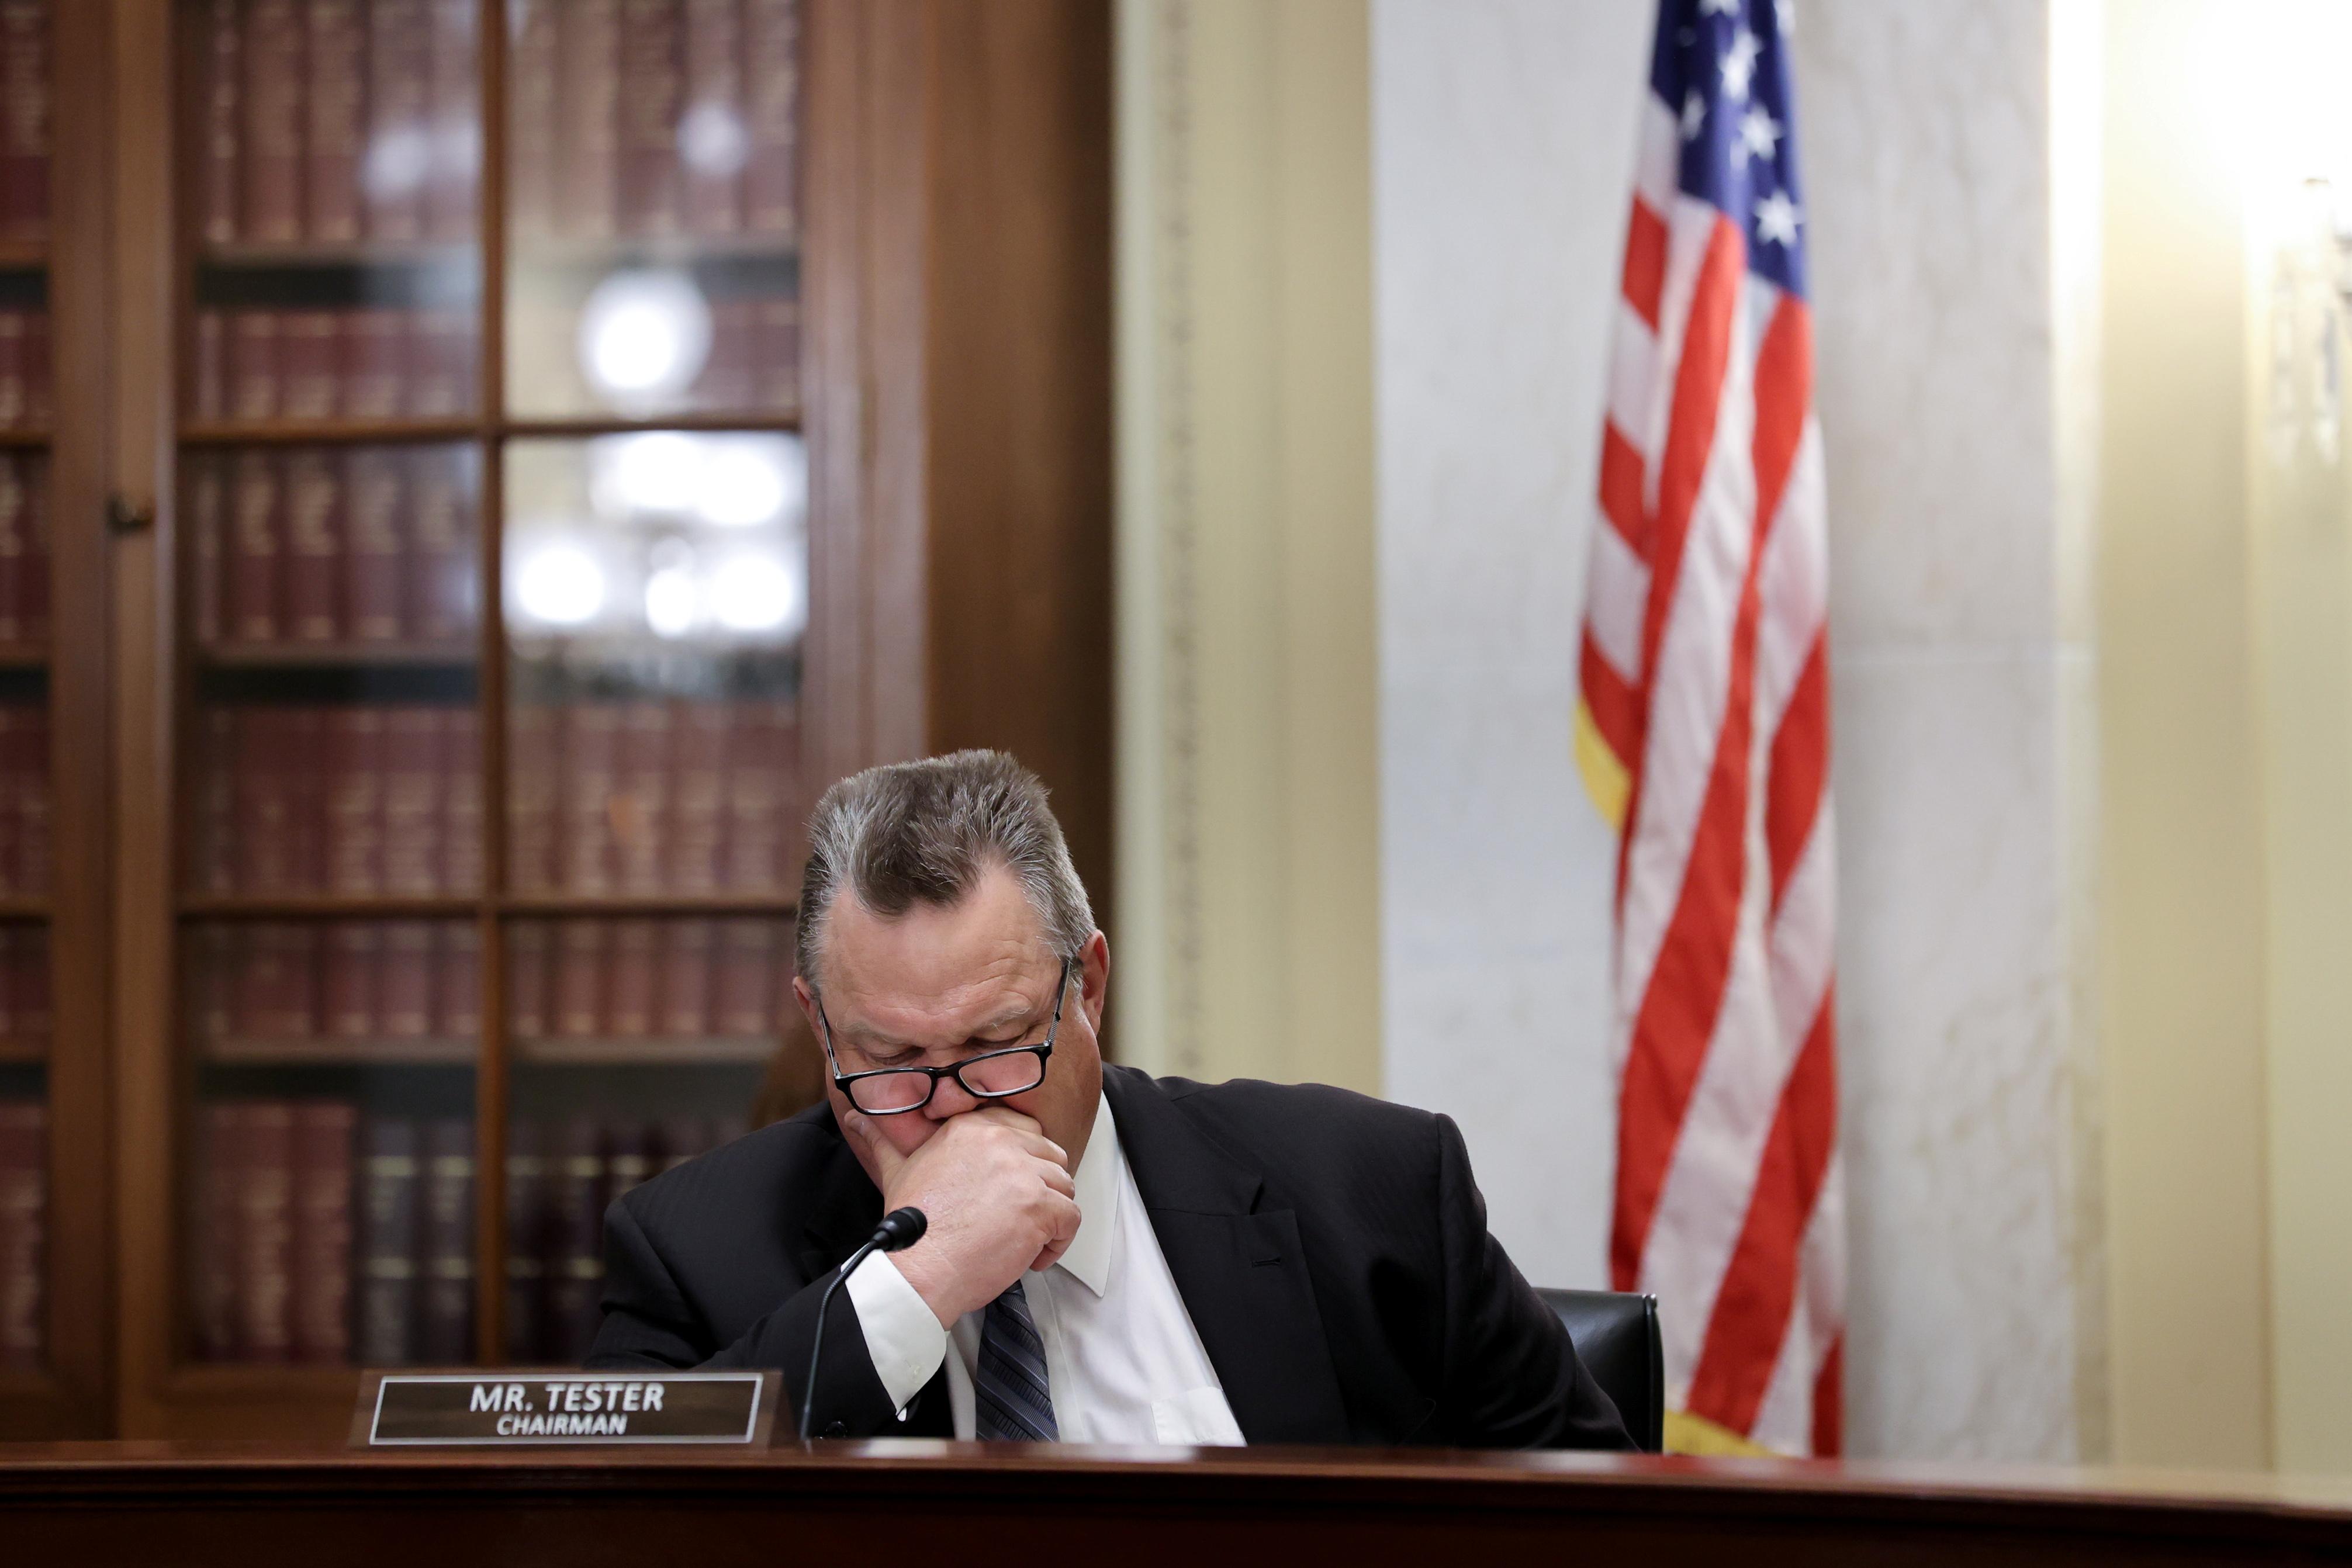 U.S. Senator Jon Tester (D-MT) chairs a Veterans Affairs Committee hearing on Capitol Hill in Washington, U.S. June 9, 2021.  REUTERS/Jonathan Ernst